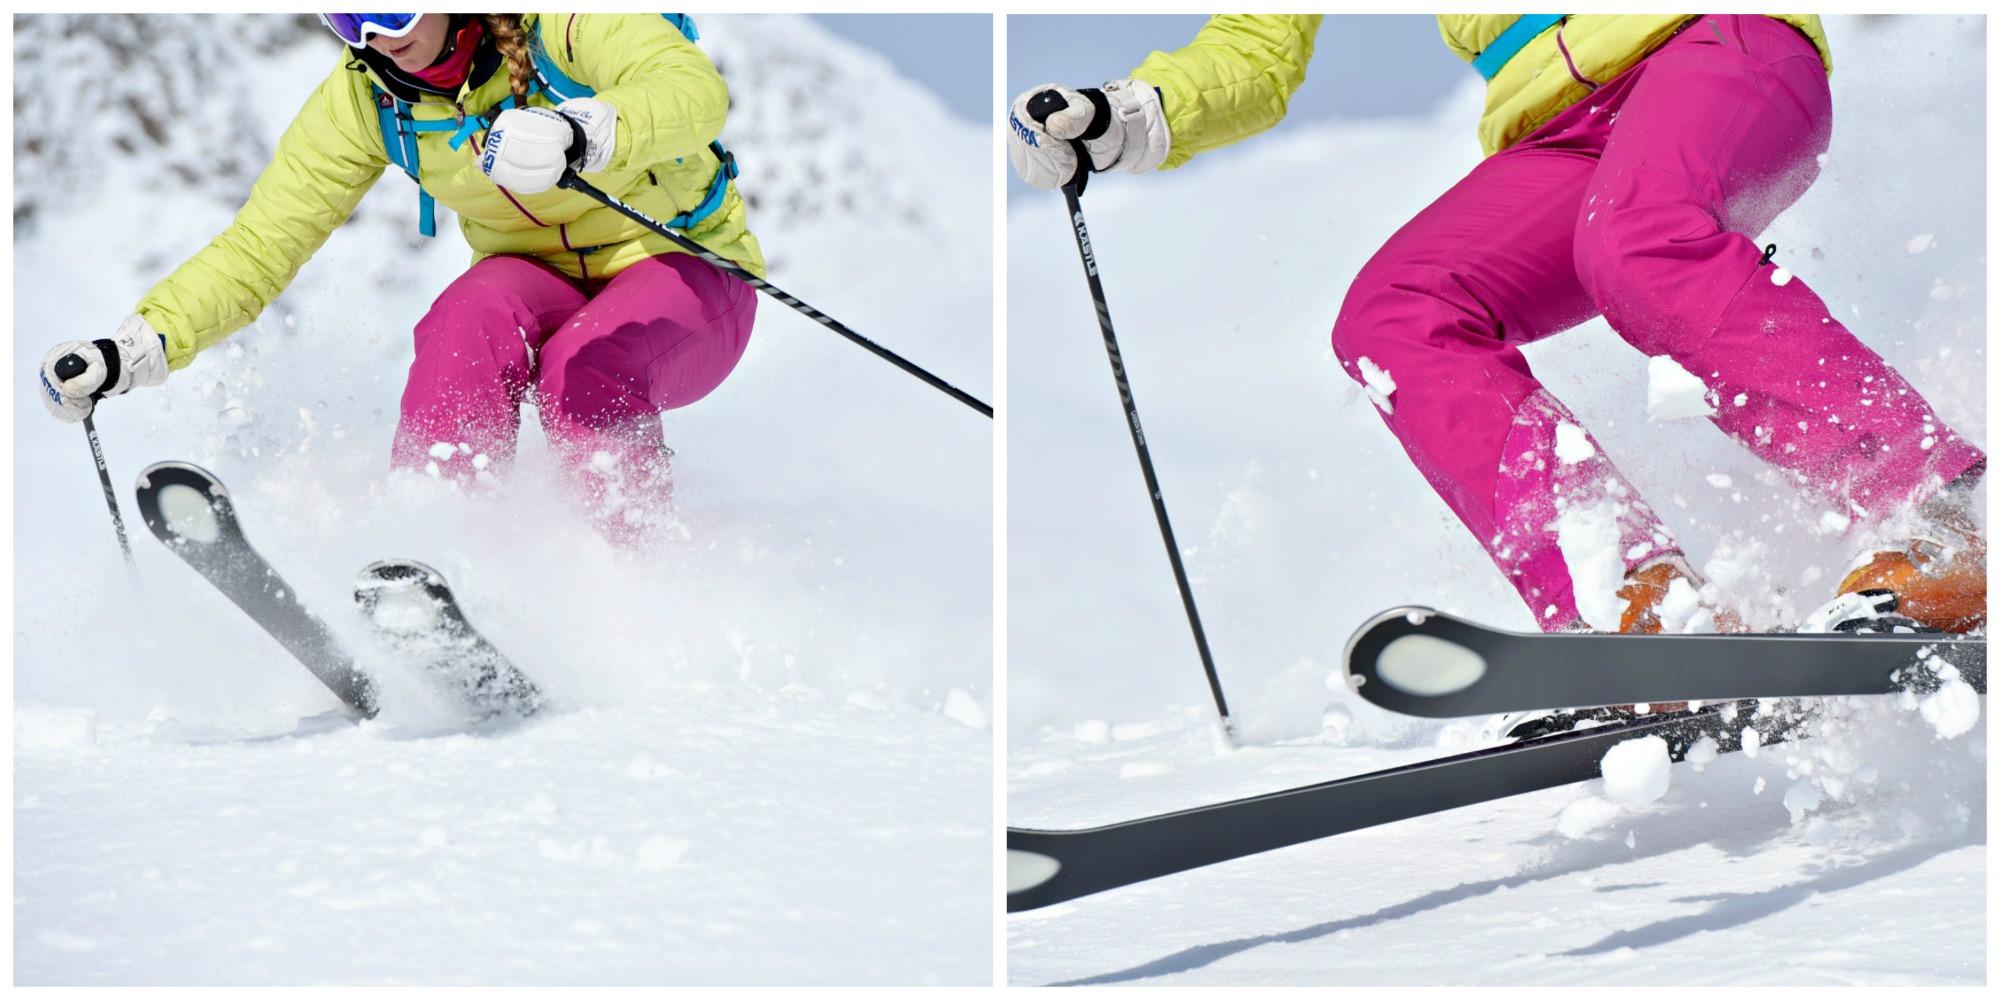 Fitnessblog-kästle-ski-klara-fuchs-österreich-blogger-sport-winter24-collage